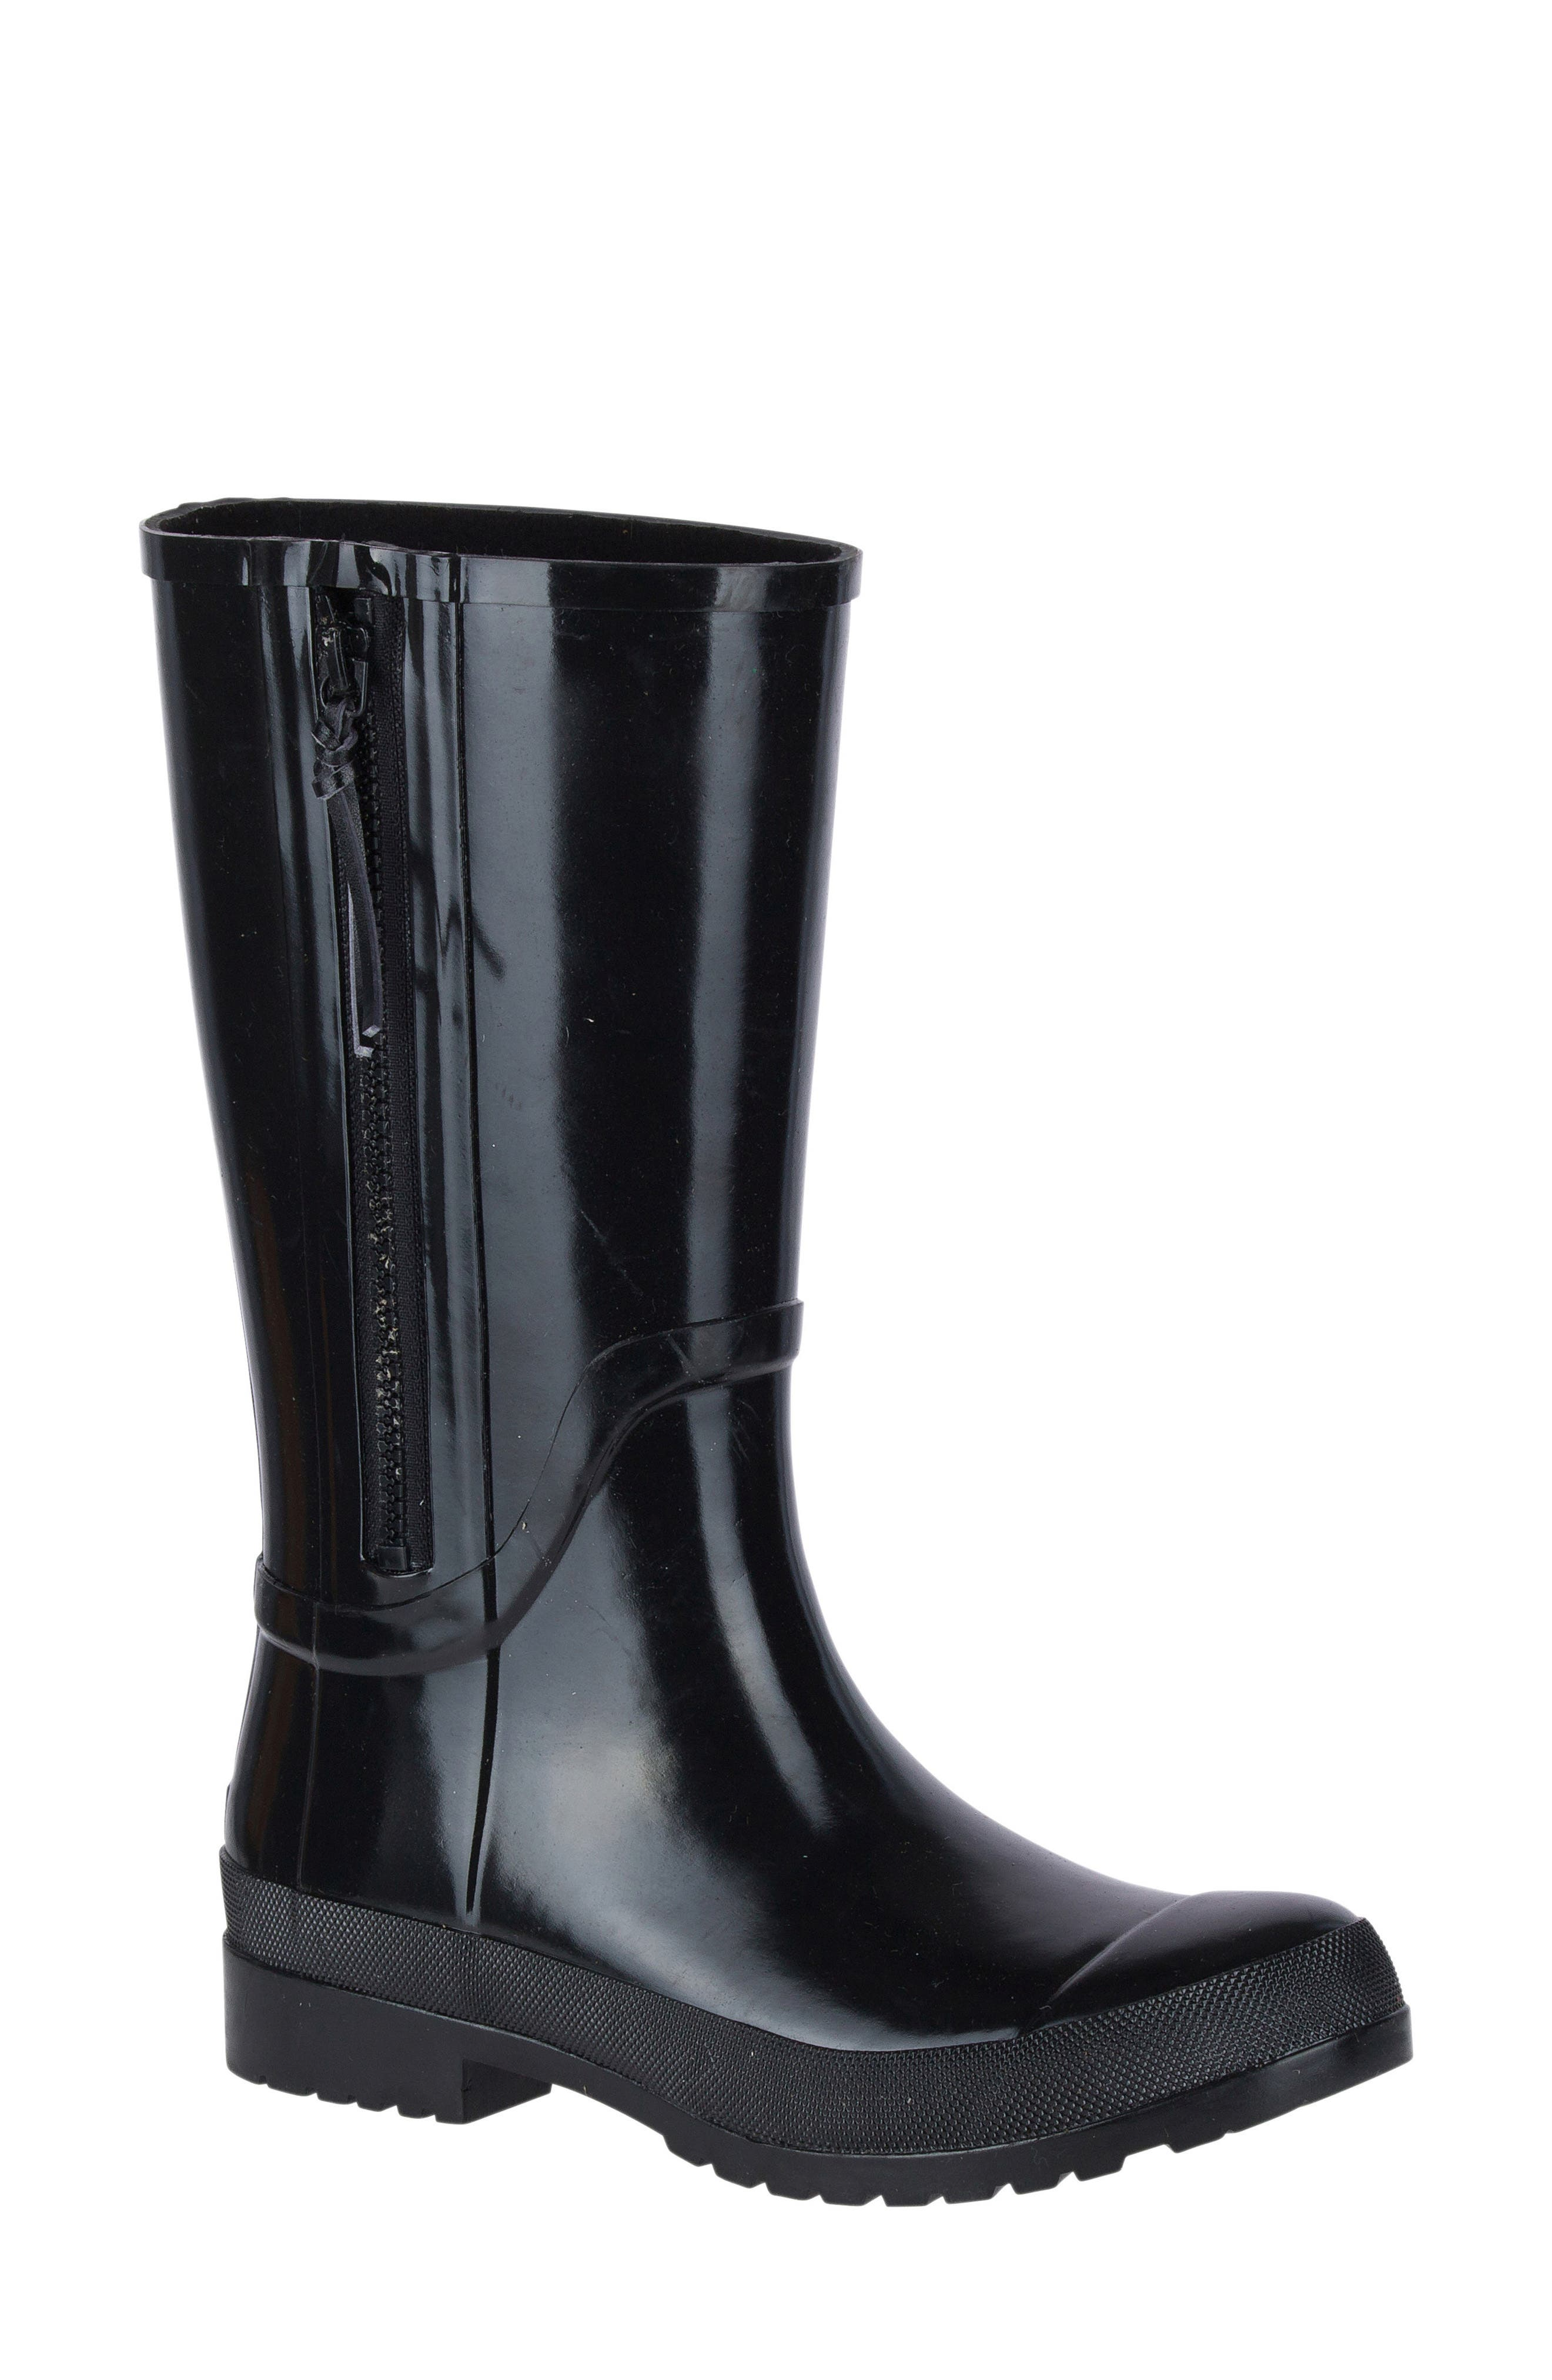 Alternate Image 1 Selected - Sperry Walker Rain Boot (Women)